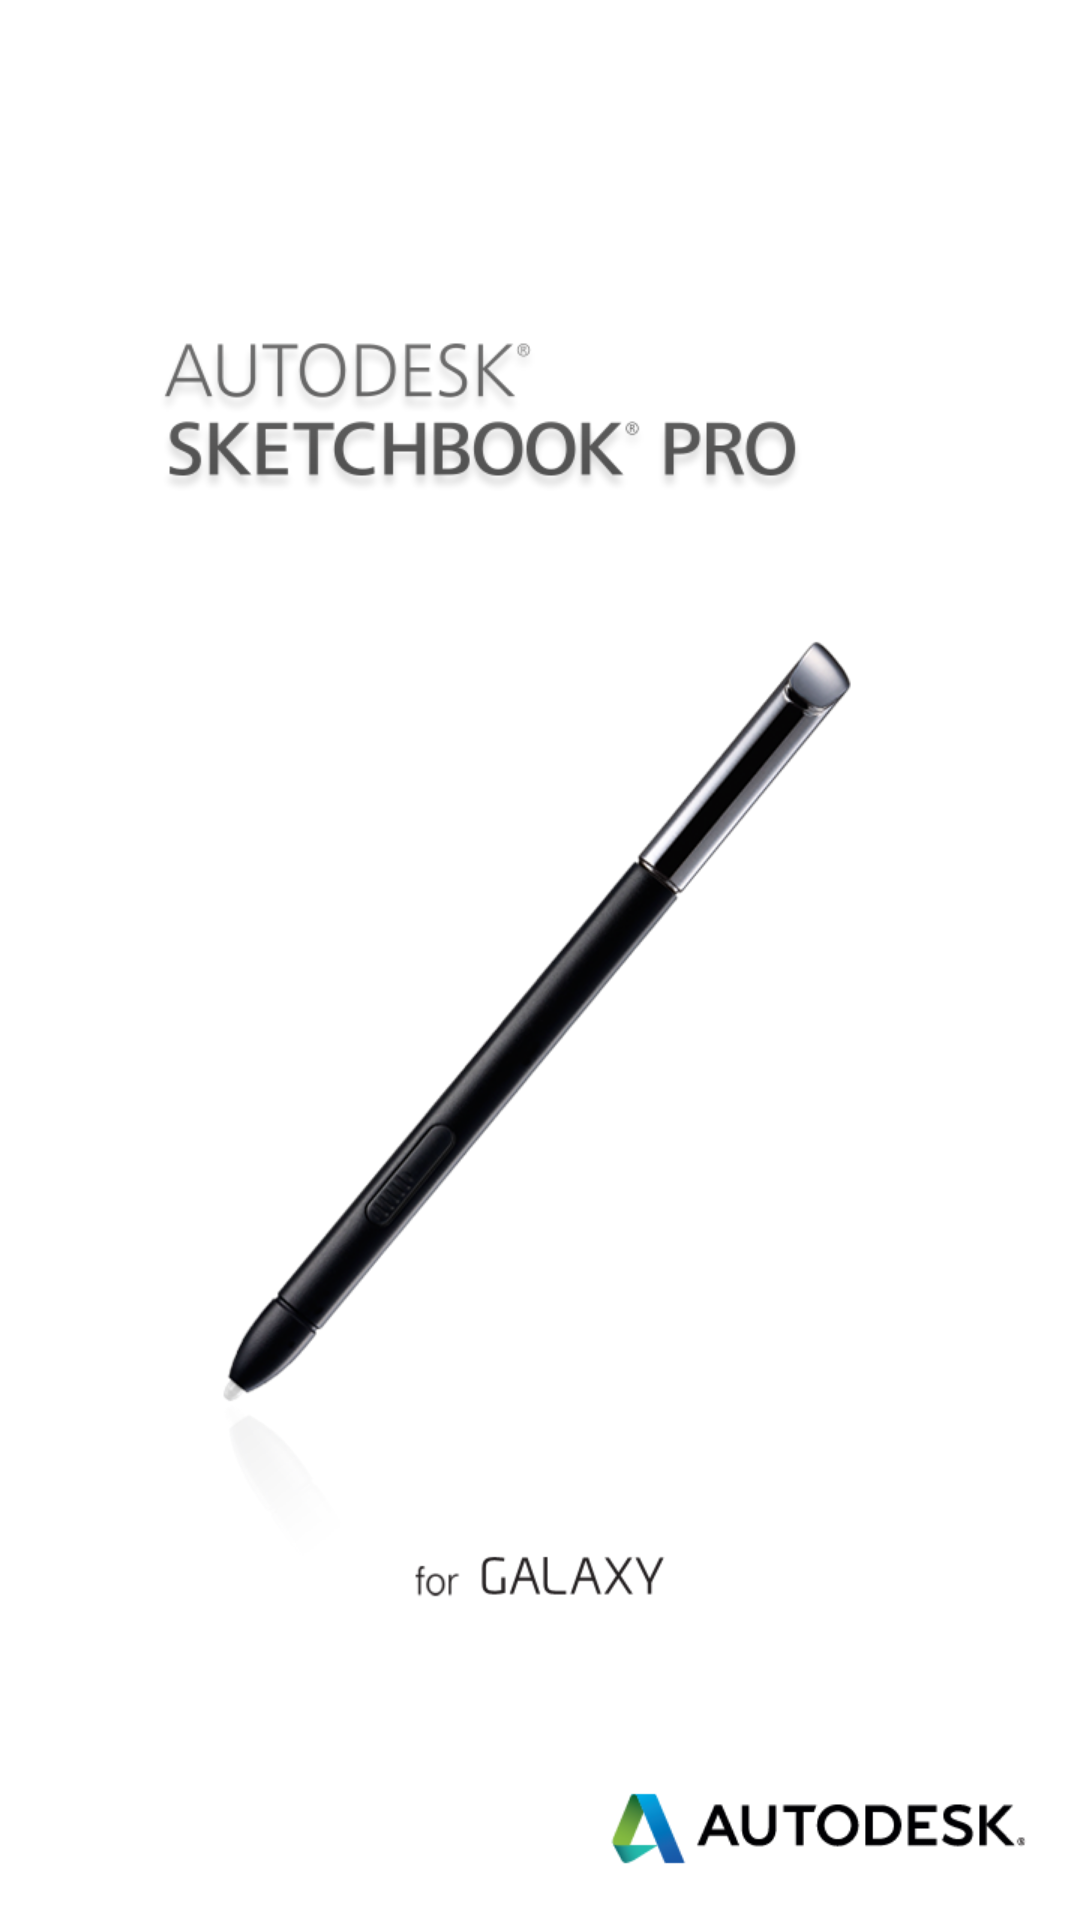 妙笔生花 SketchBook for Galaxy截图(5)